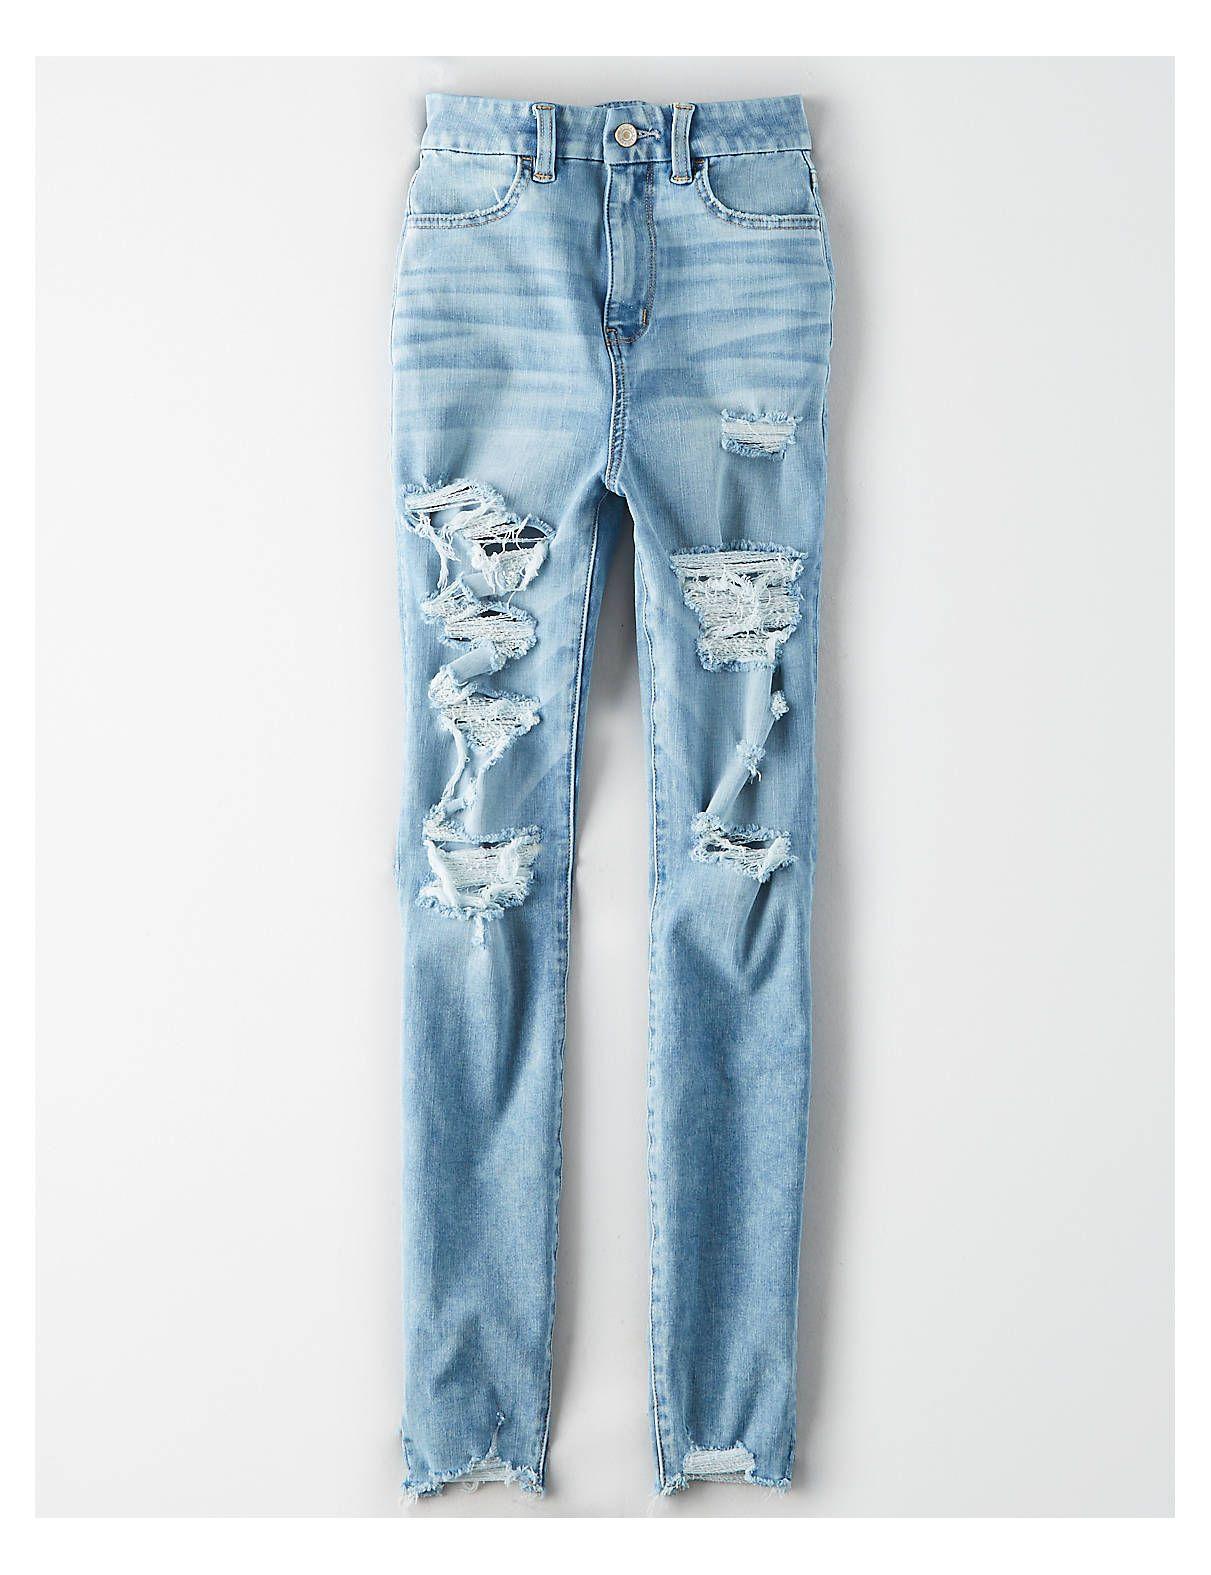 New Look Venice Black Knee Jeans Skinny Donna